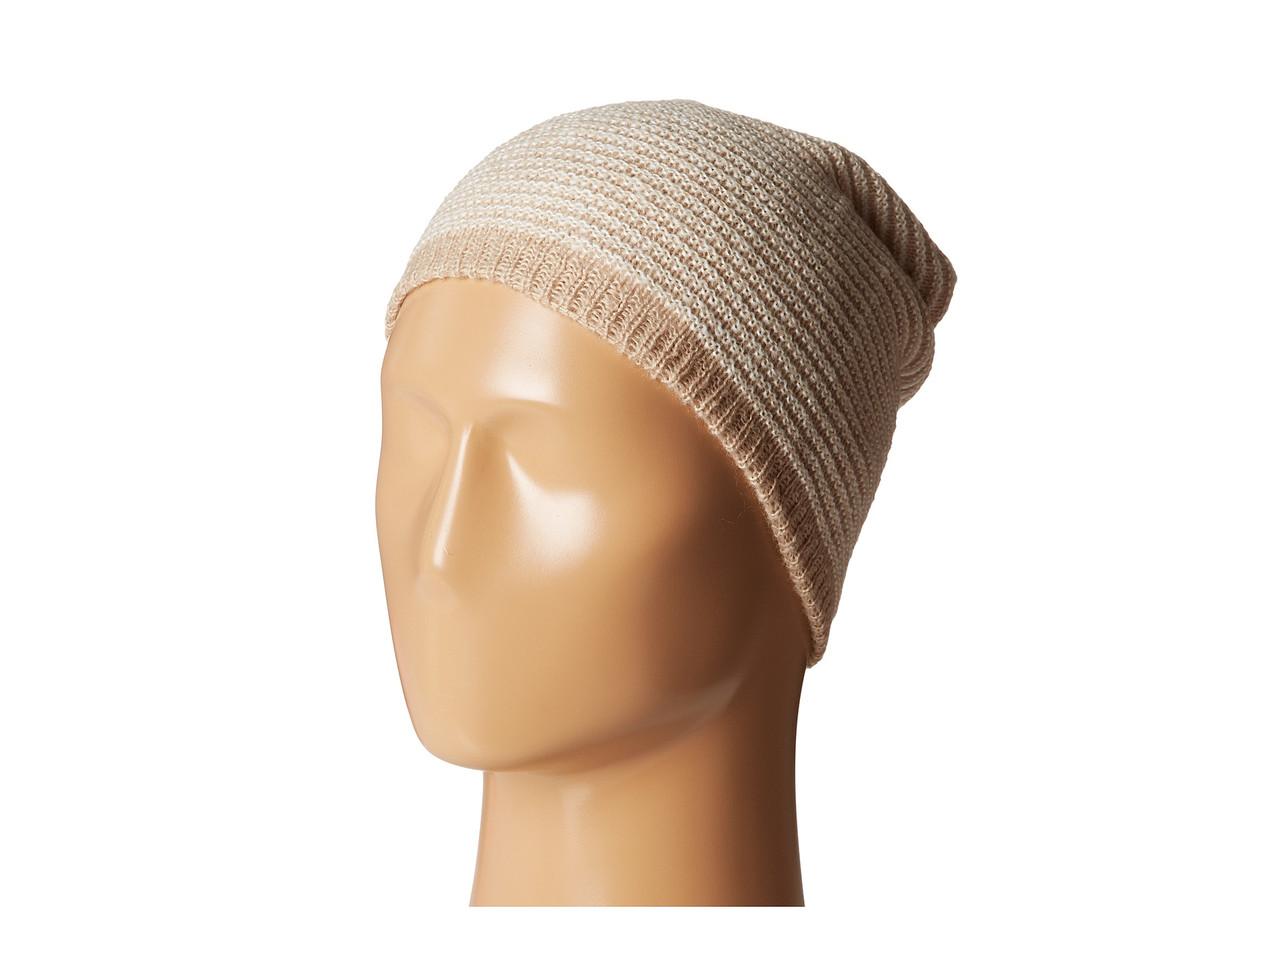 eb4ac85a4c9d Шапка Calvin Klein Reversible, HDA - брендовая женская одежда от интернет  магазина 24sale